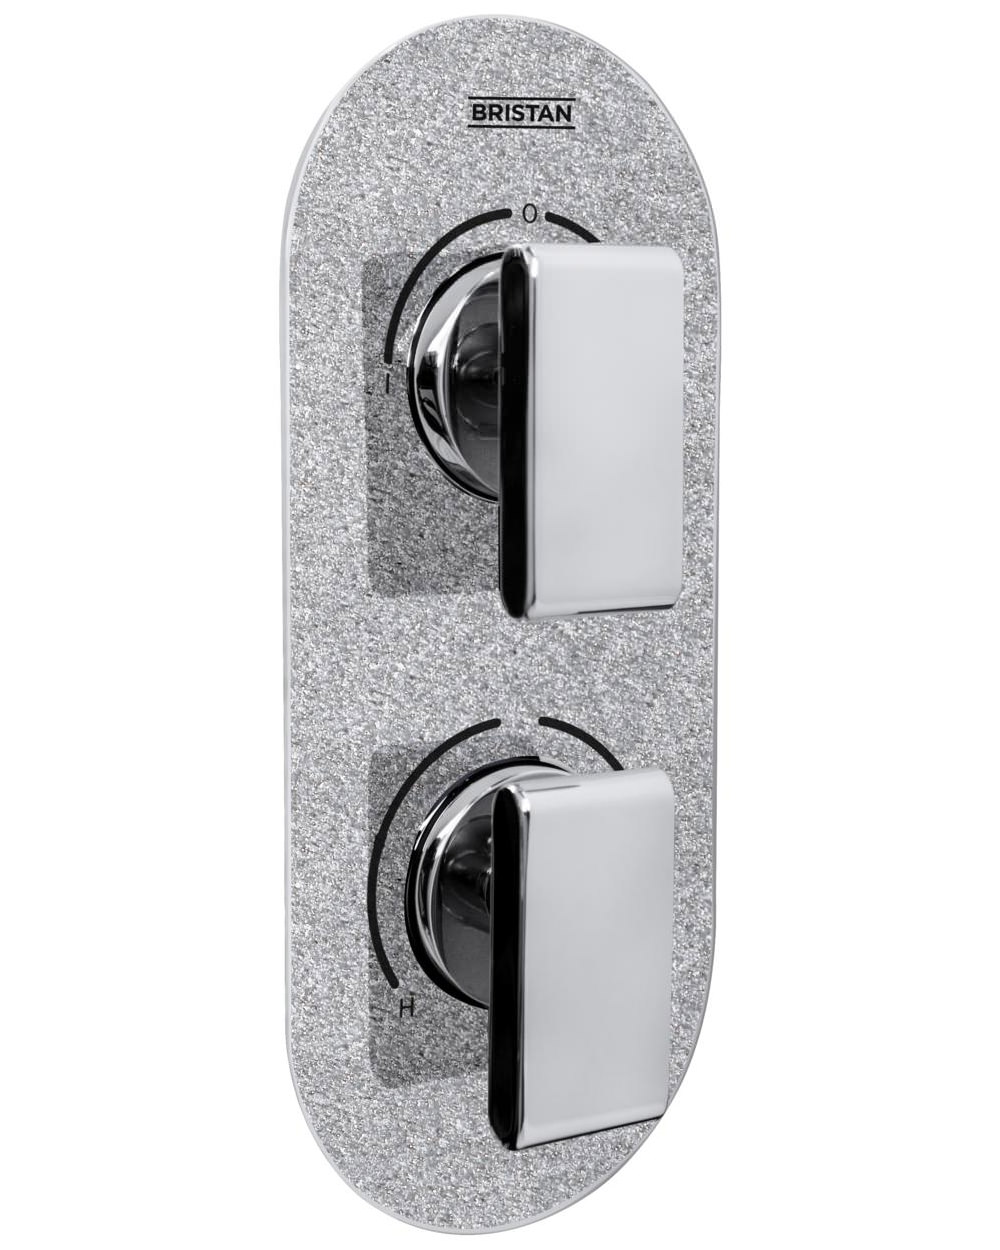 Bristan Metallix Pivot Concealed Dual Control Thermostatic